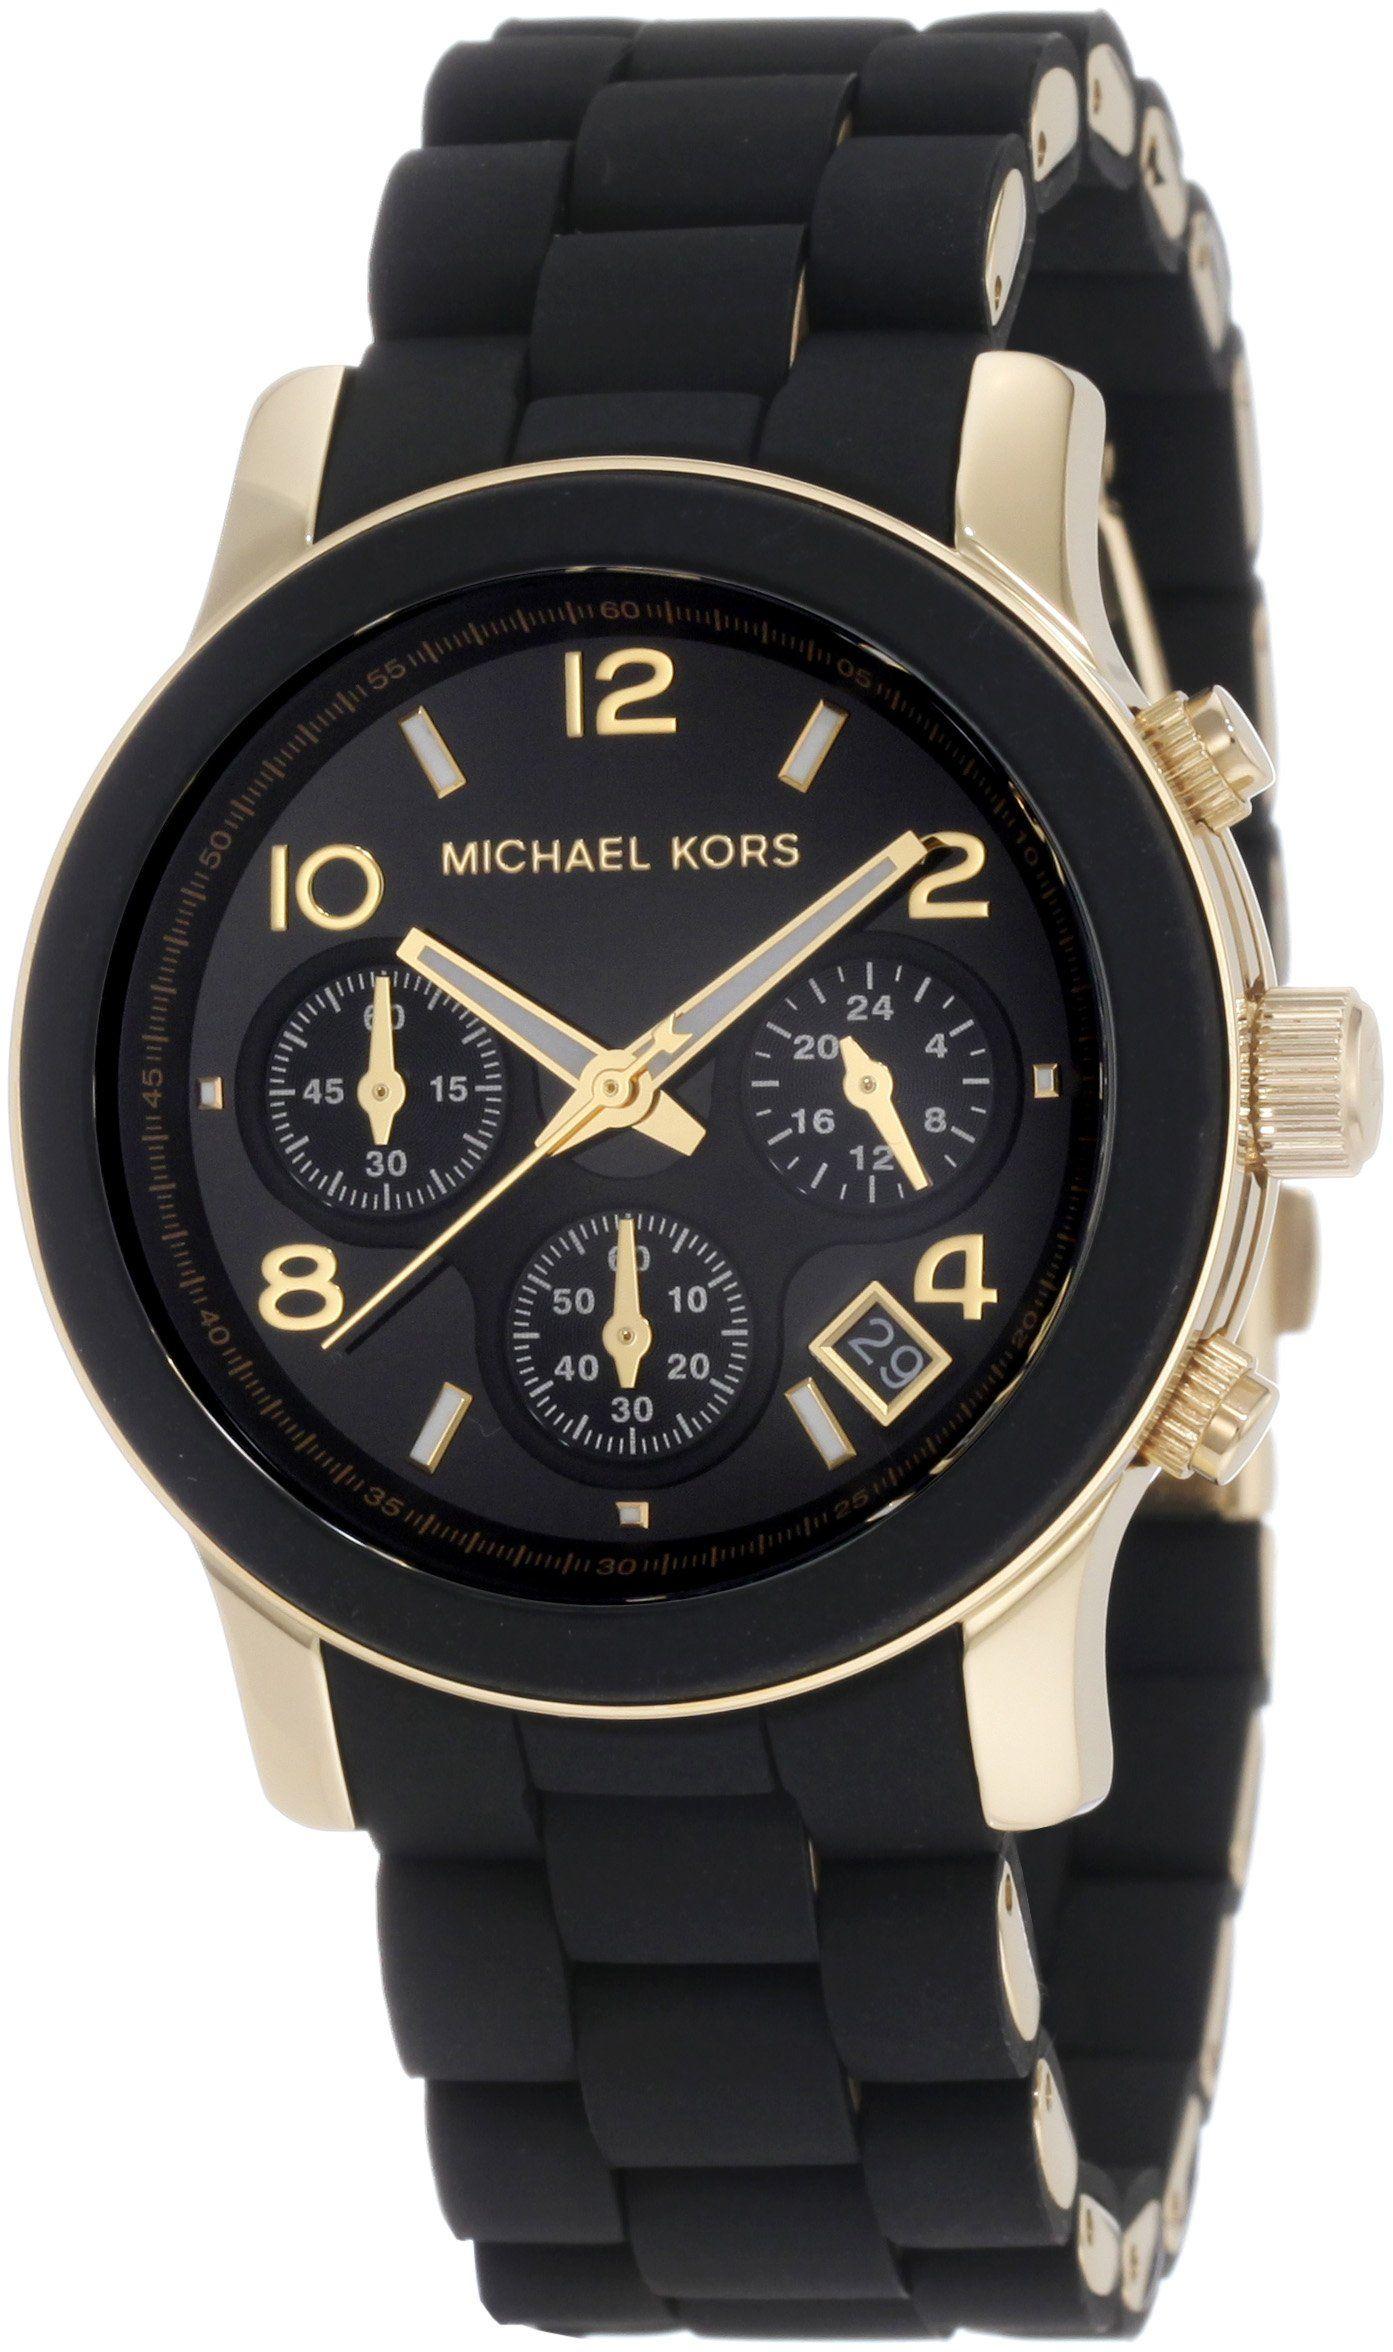 MICHAEL KORS MK5191 - Reloj analógico de cuarzo para mujer con correa de acero  inoxidable 610e87e70df5